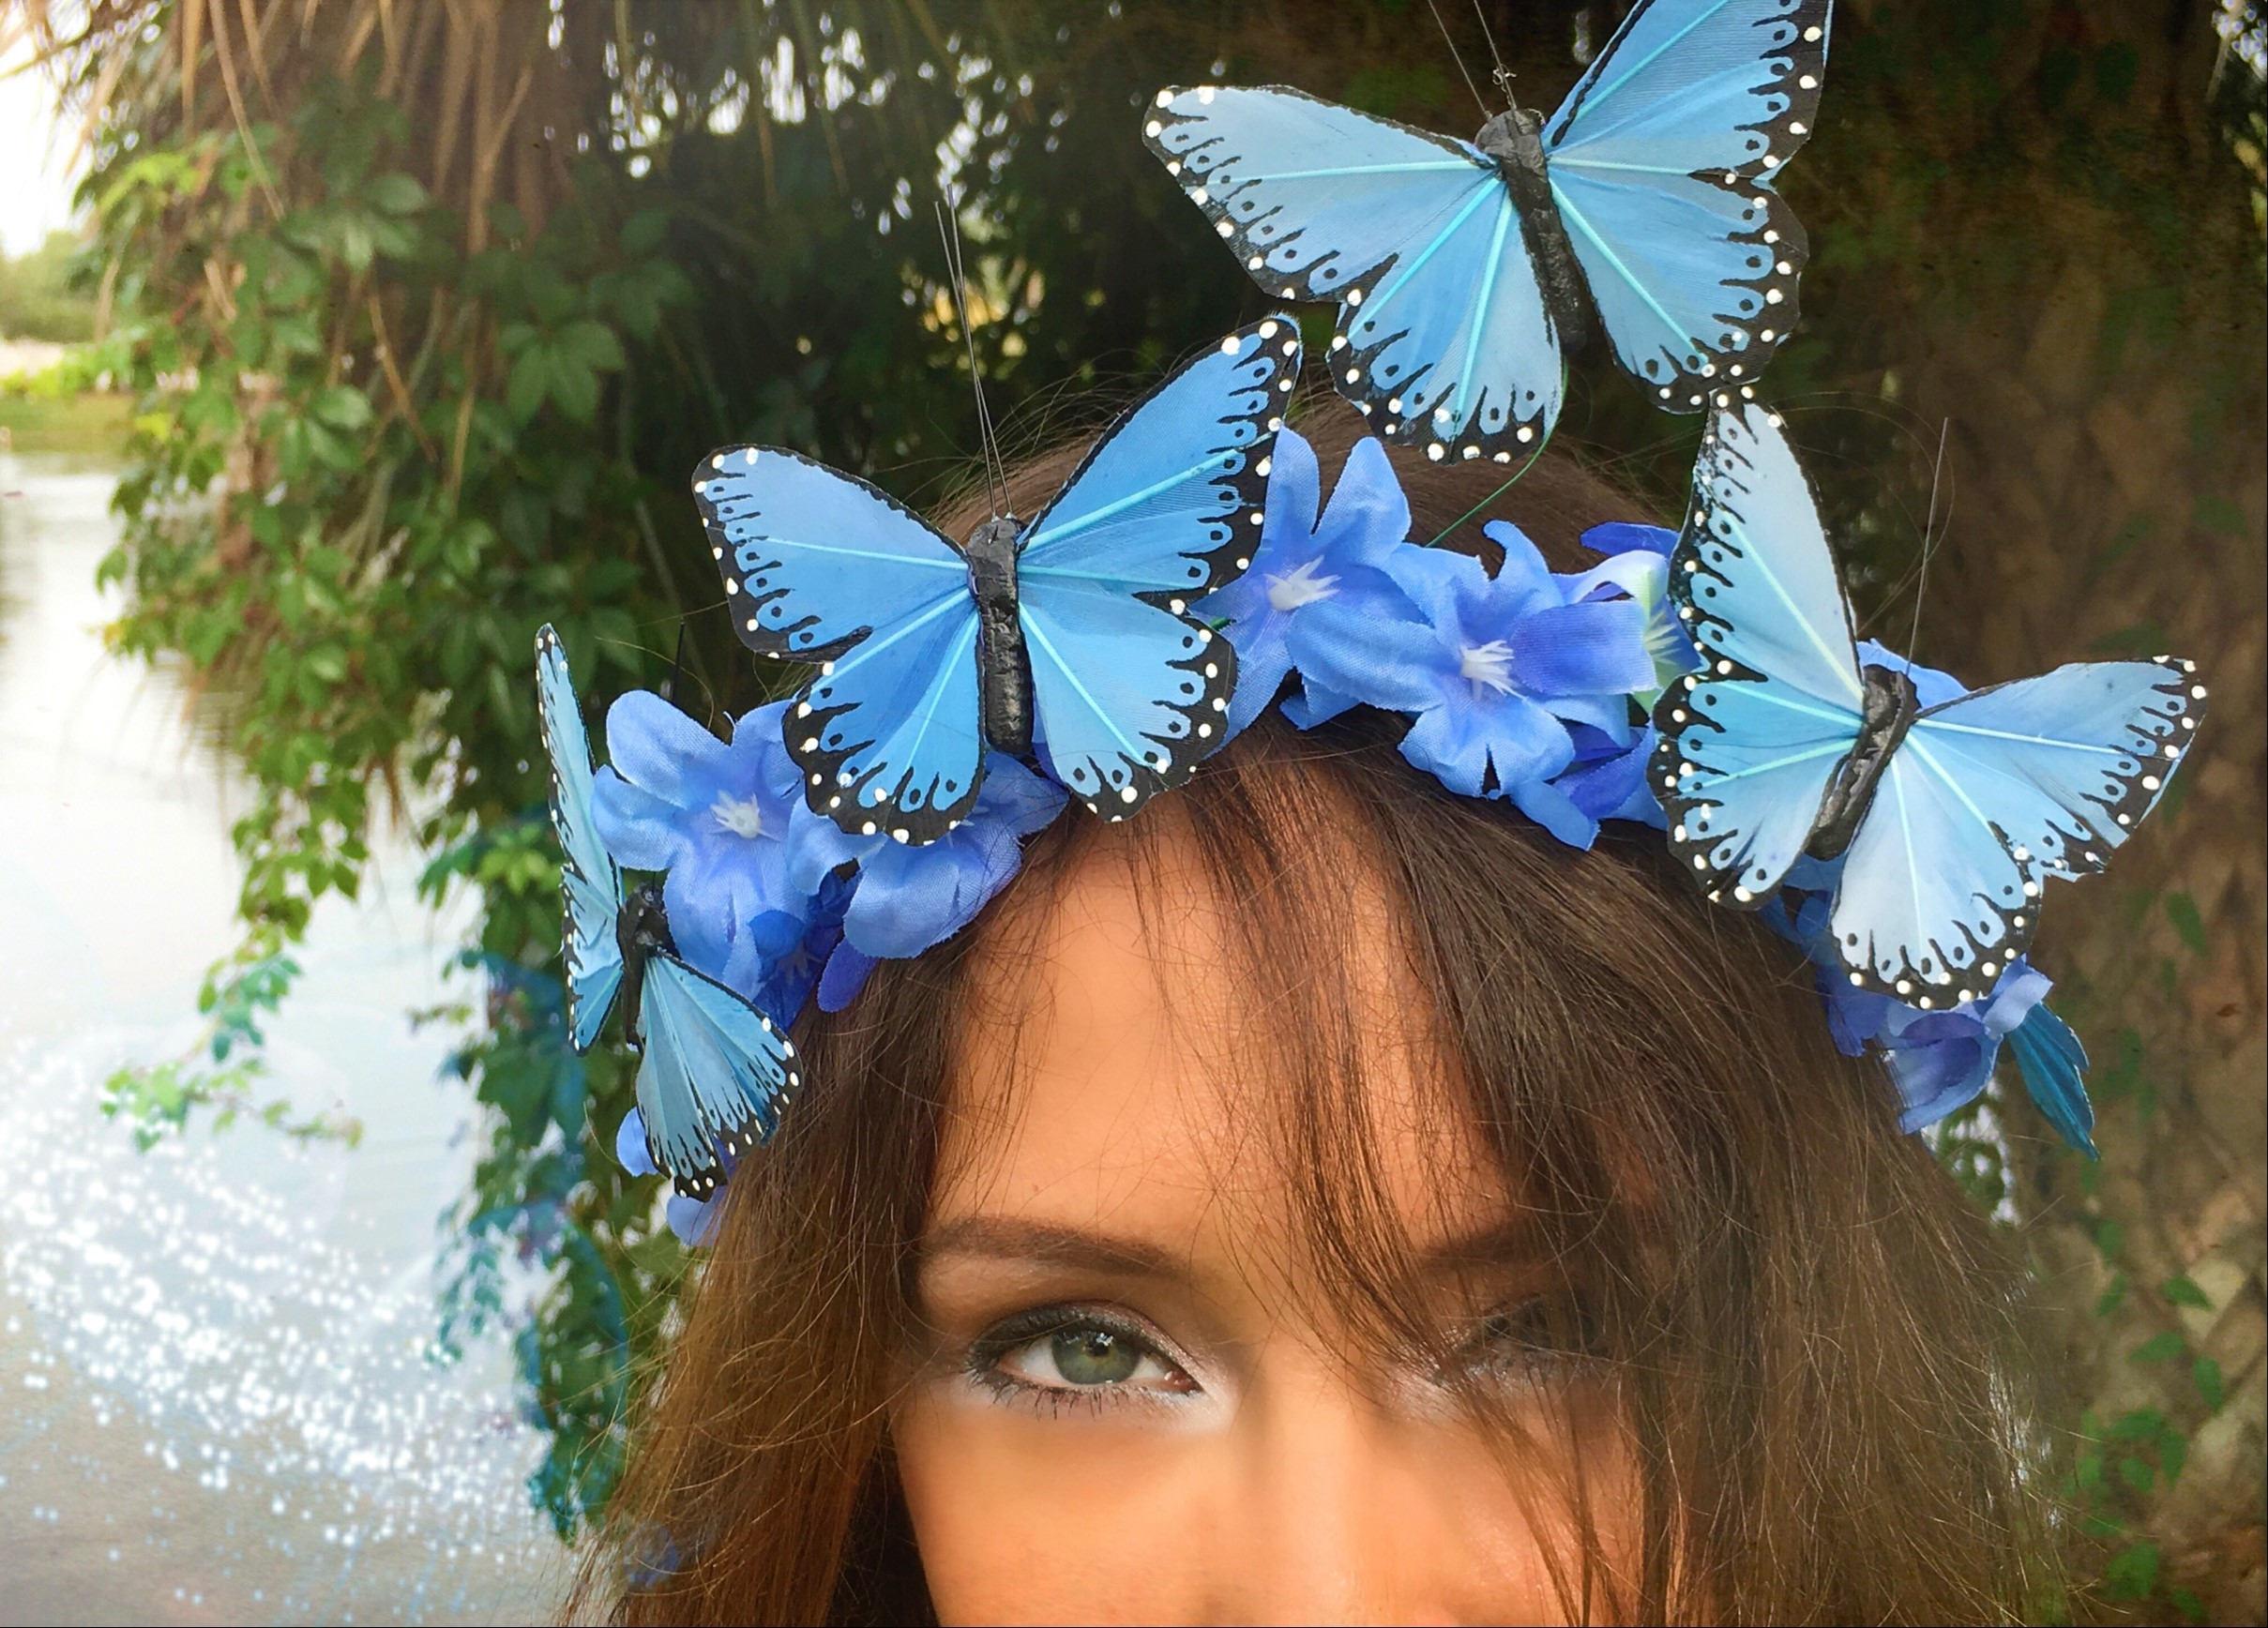 Blue Dream - Monarch Butterfly EDM Festival Headband, Butterfly Crown,  Festival hair decor, Boho headband, Butterfly Fascinator, Blue Crown from  Nifty